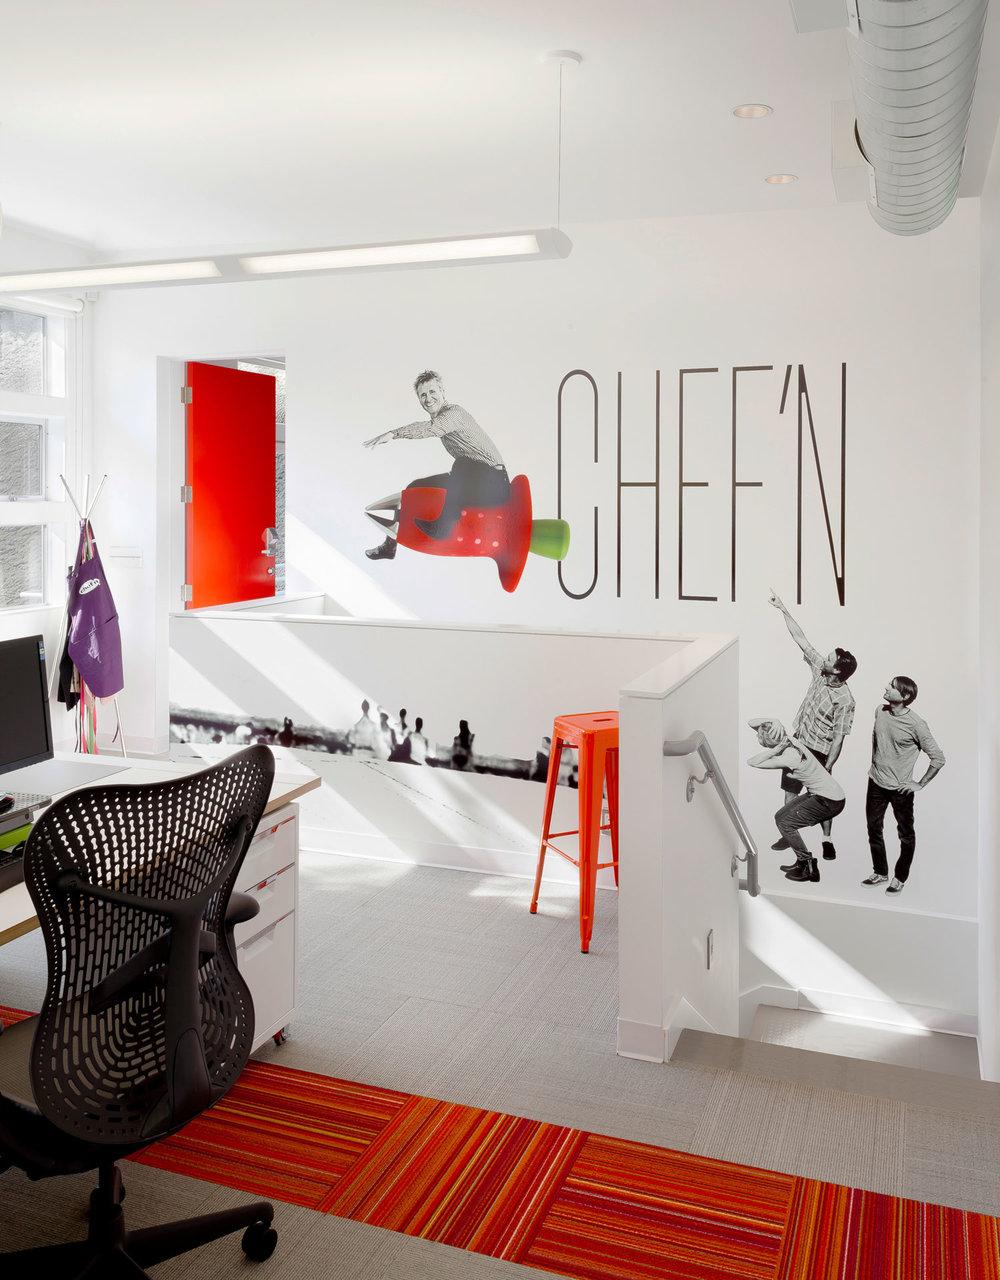 Chefn-Labs_TBp-004-Editedweb.jpg